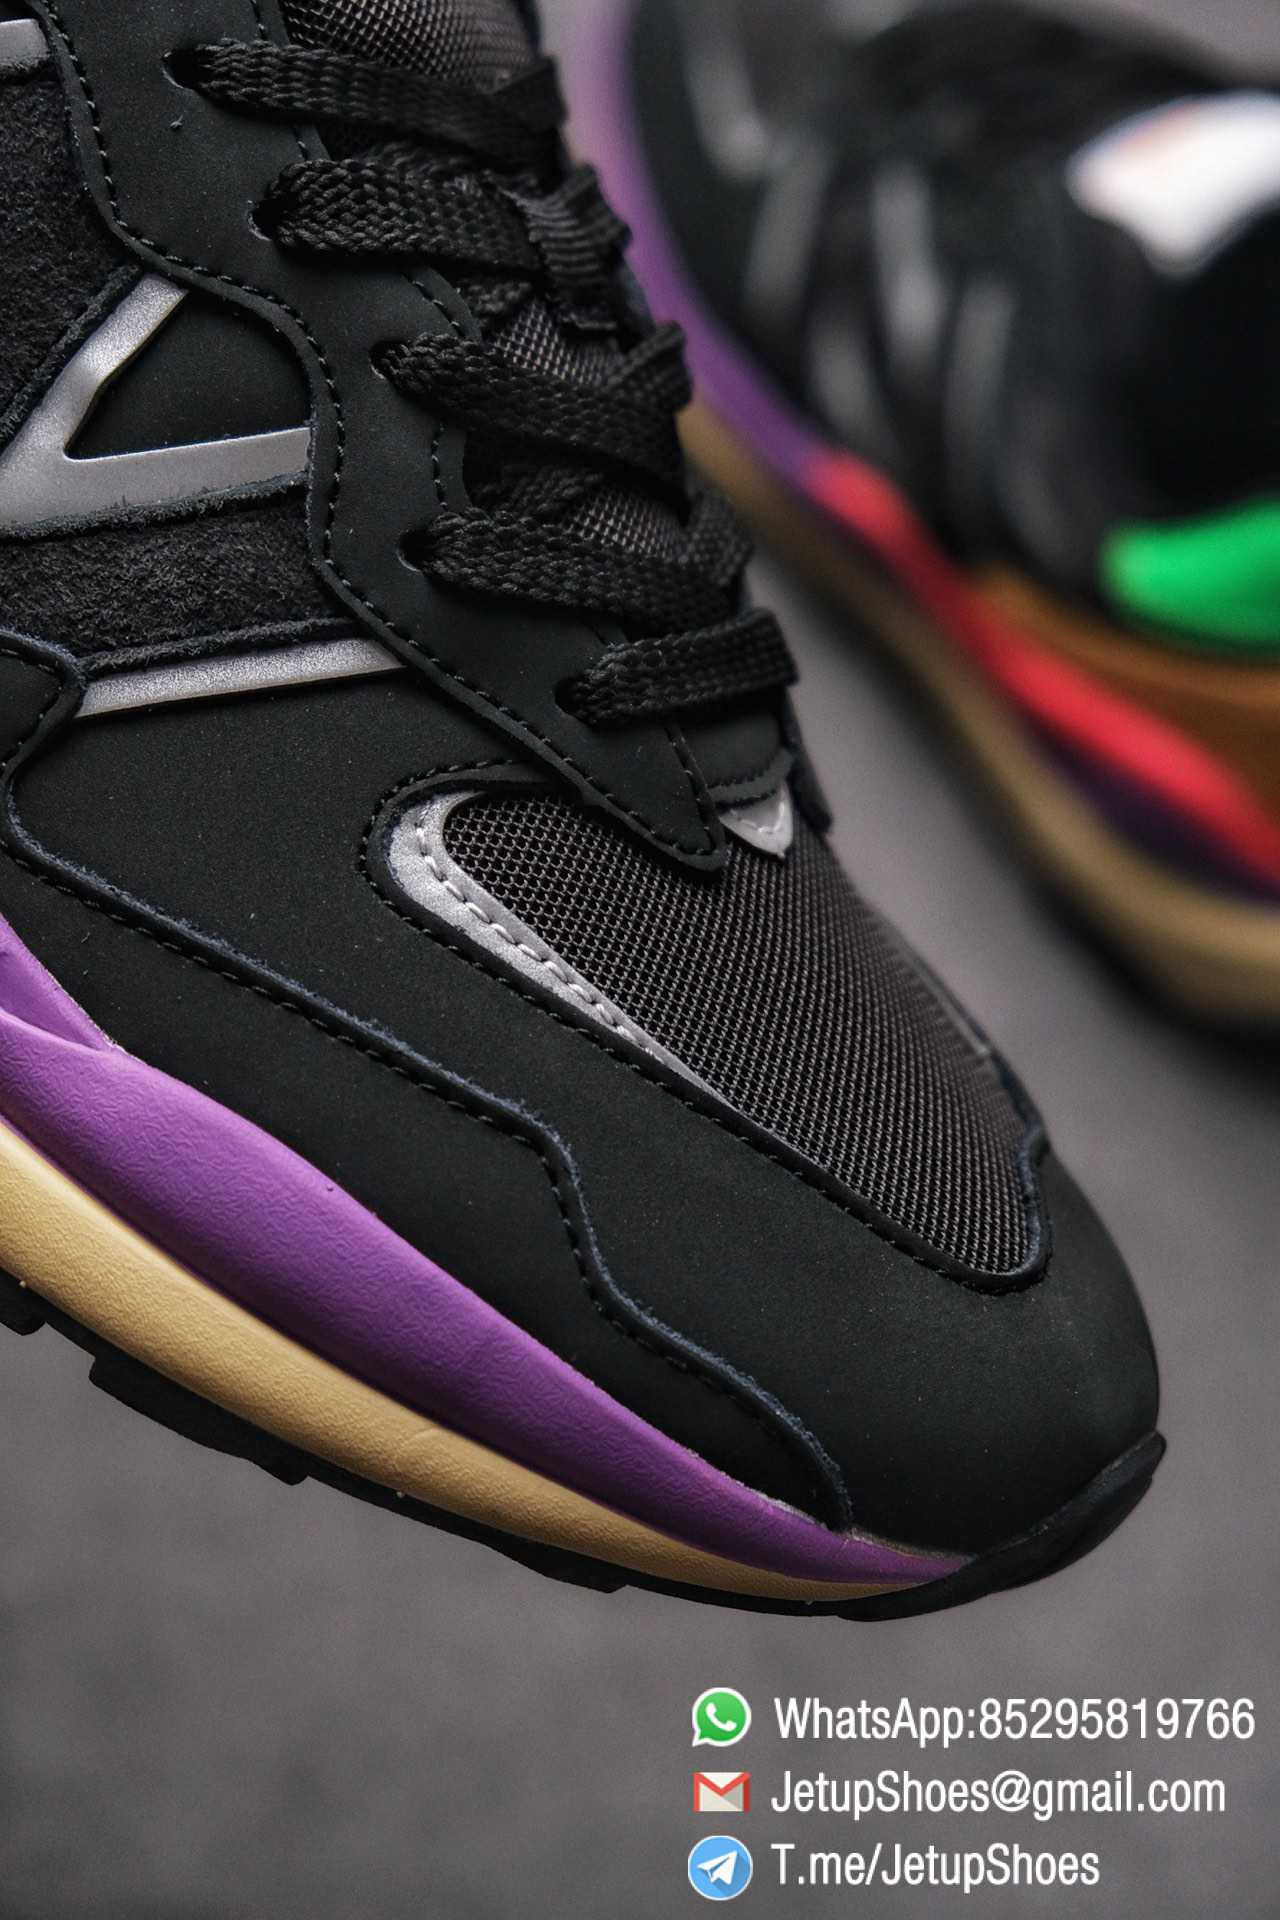 New Balance 5740 Black Multicolor Running Sneakers M5740LB Black Mesh Upper Oriange Suede Oversized N 06